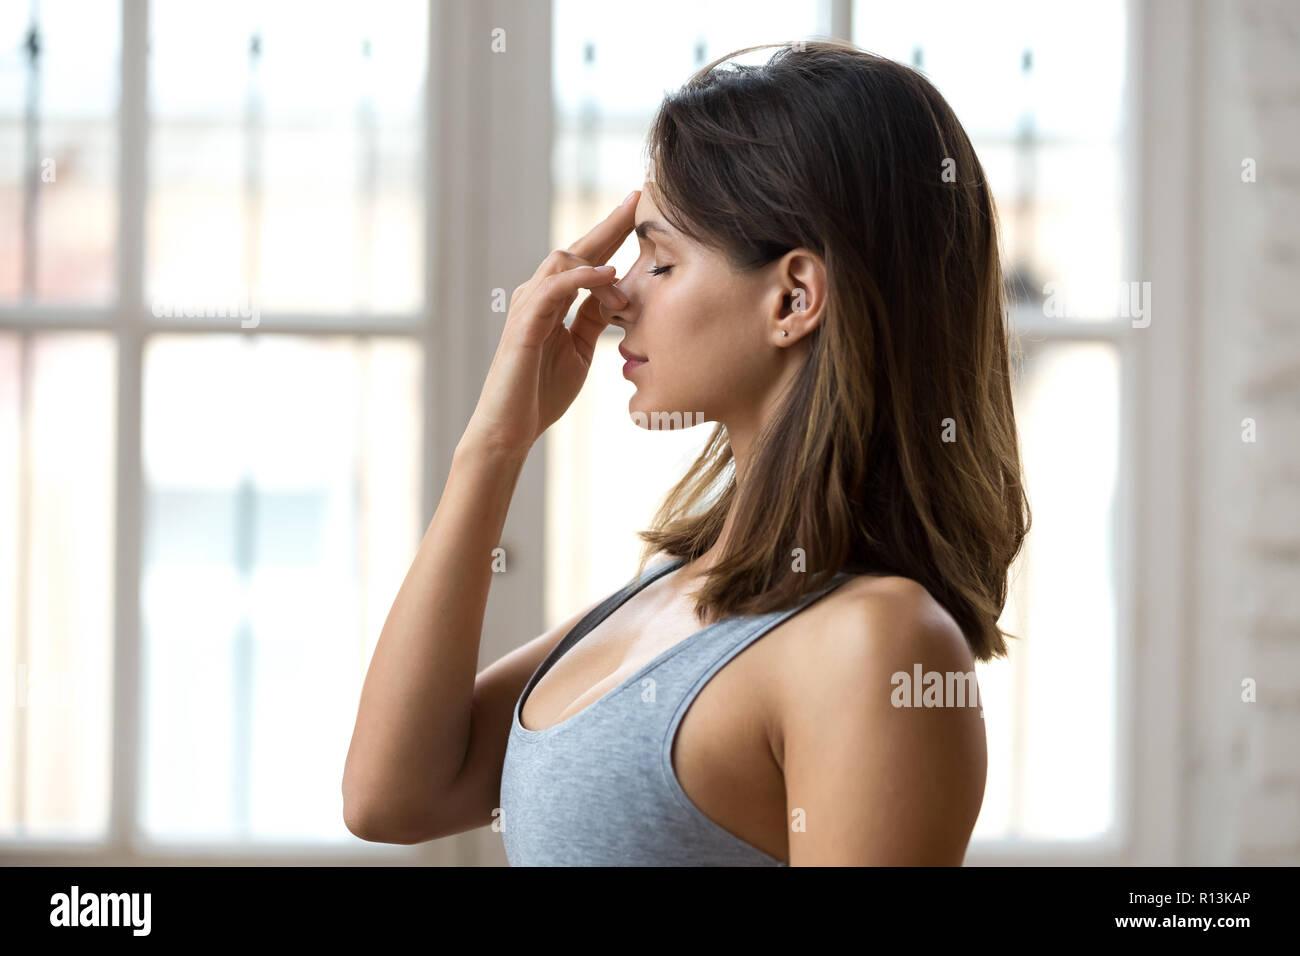 Young woman practicing yoga, nadi shodhana pranayama pose